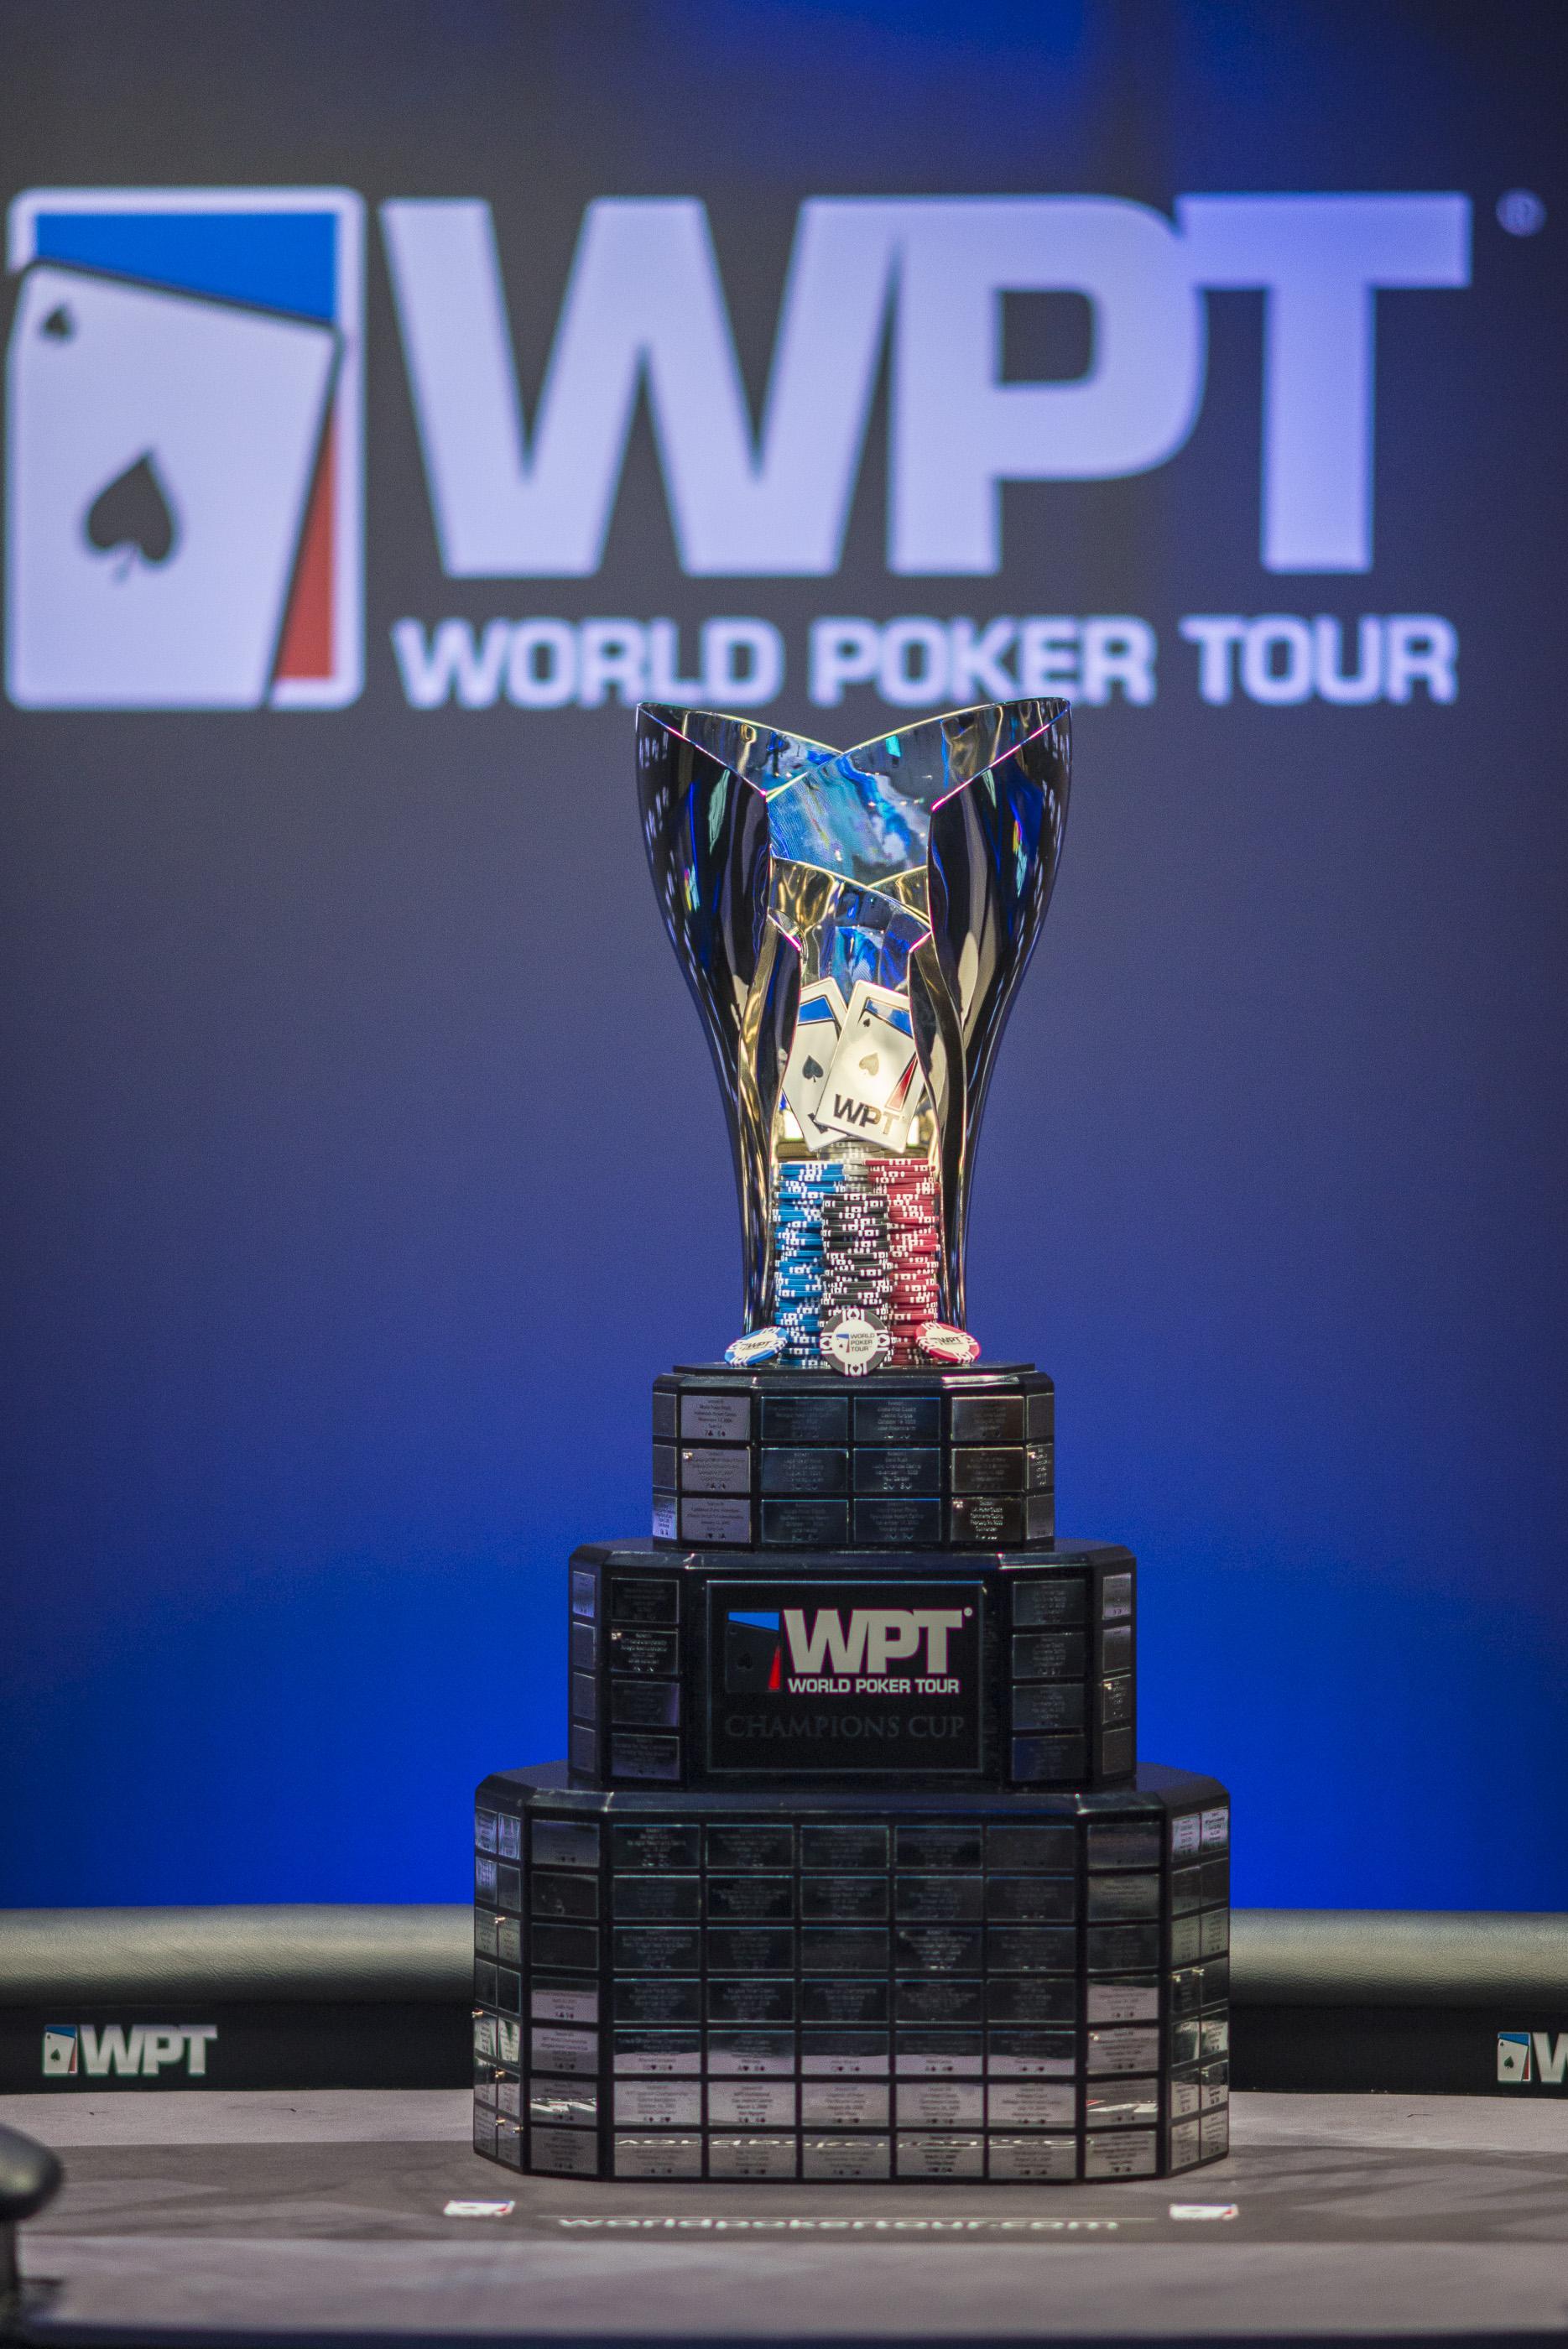 World Poker Tour_WPT Champions Cup_DA64214.jpg